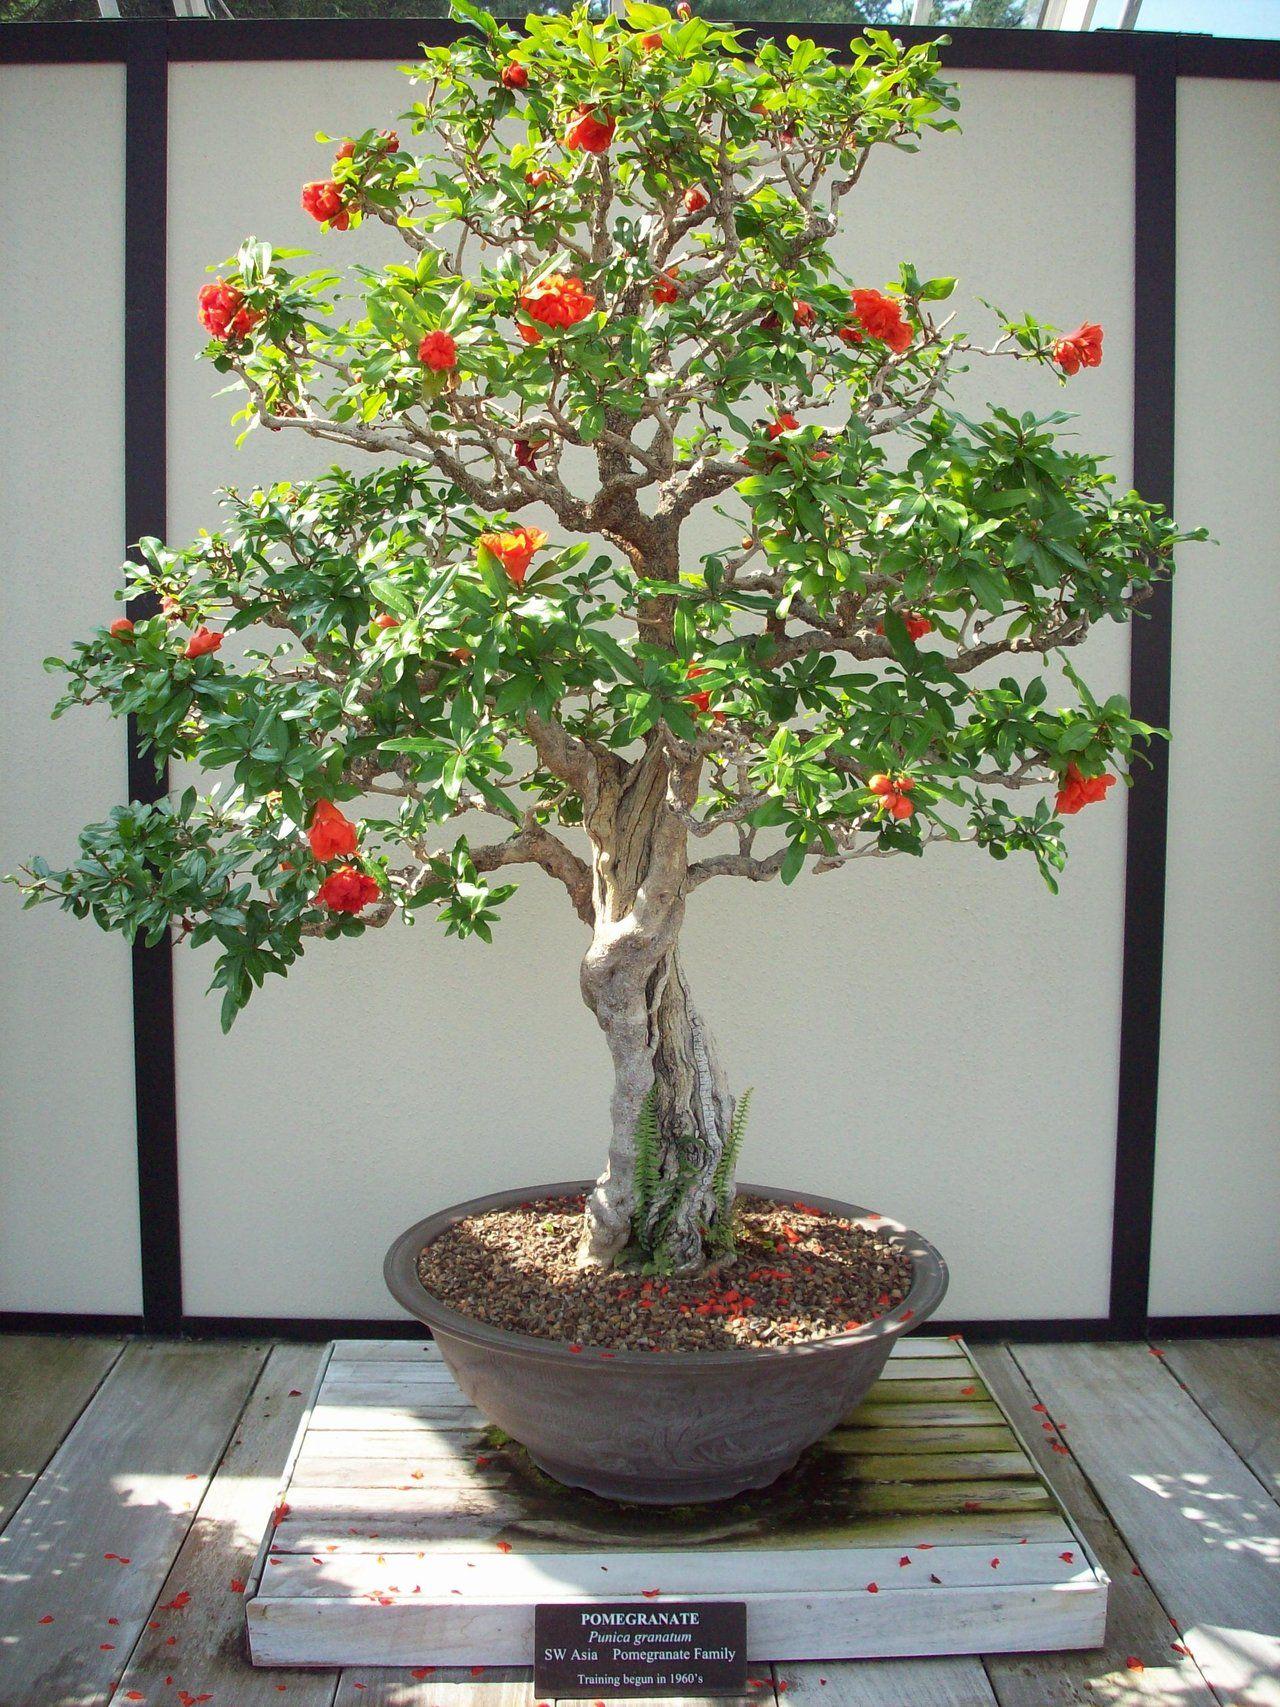 Pomegranate Bonsai By Omega856 On Deviantart Bonsai And Ikebanas